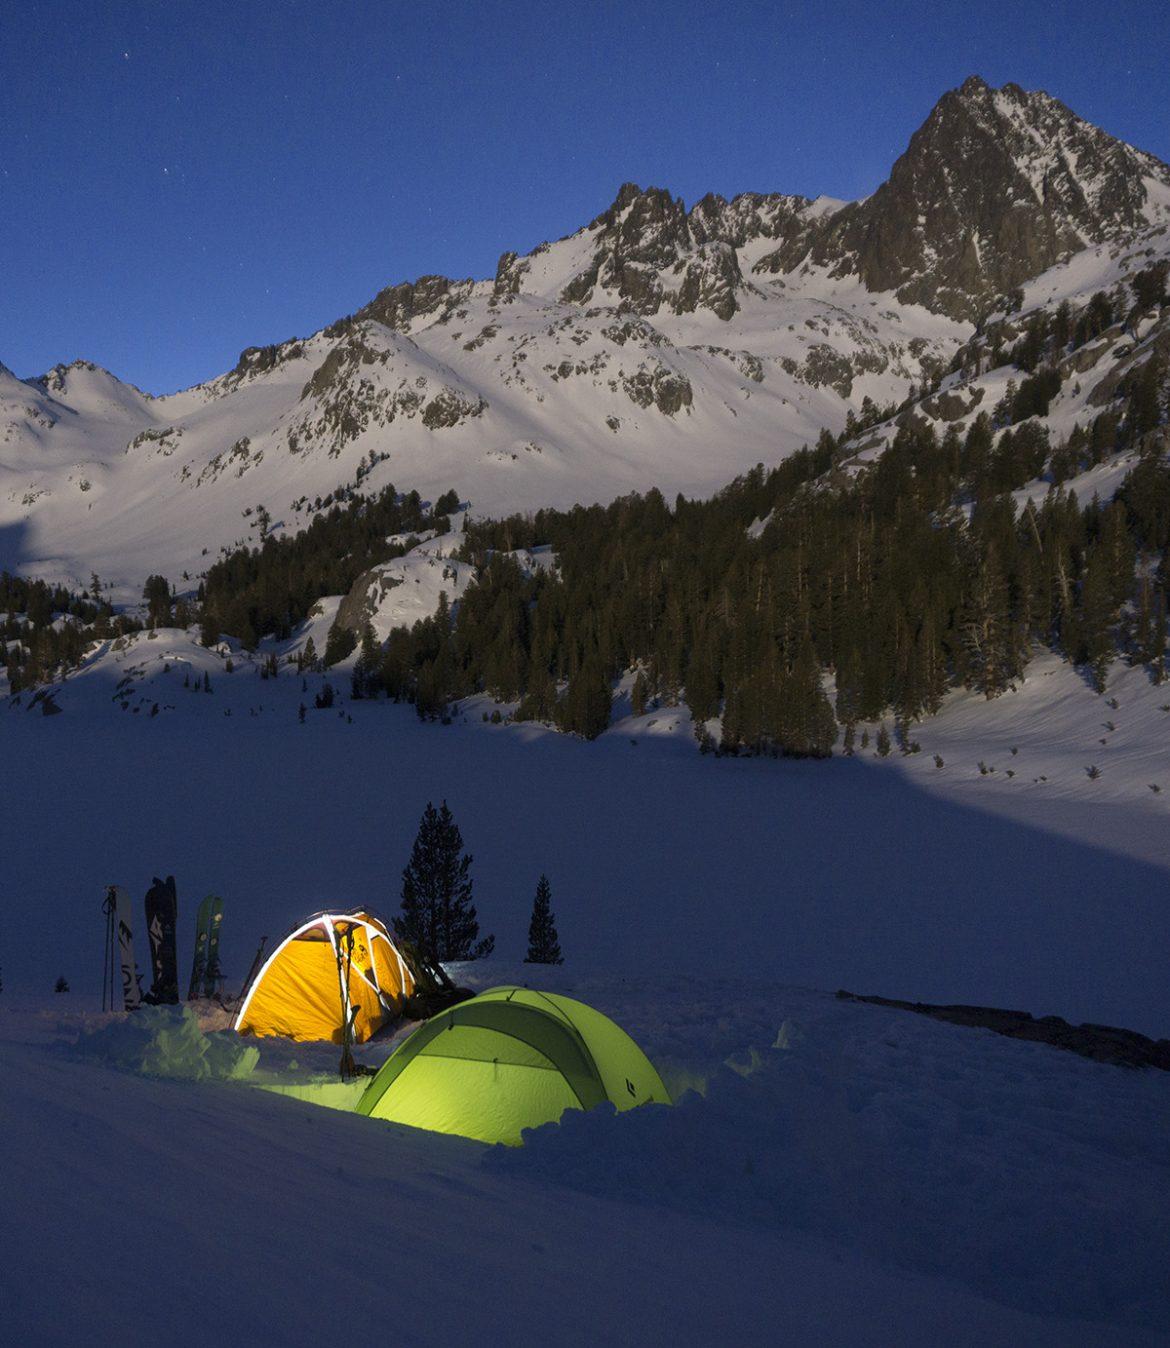 Snowboard travel grant